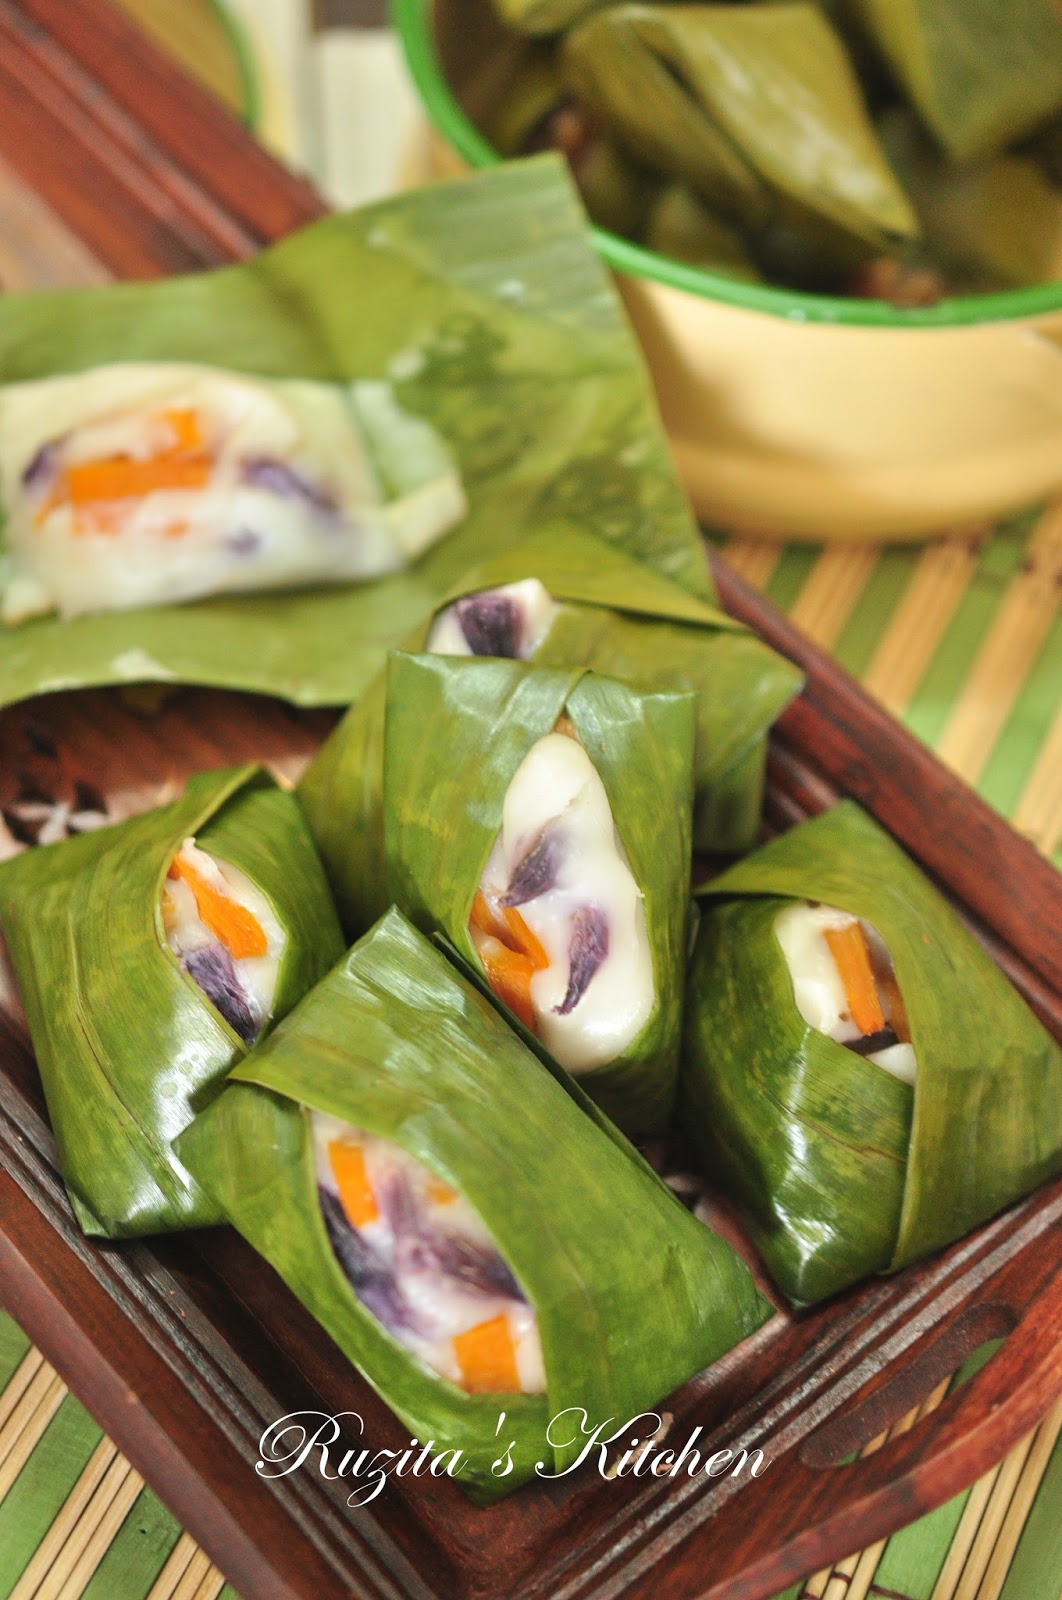 ruzitas kitchen belbat keledek Resepi Biskut Limau Sunkist Enak dan Mudah